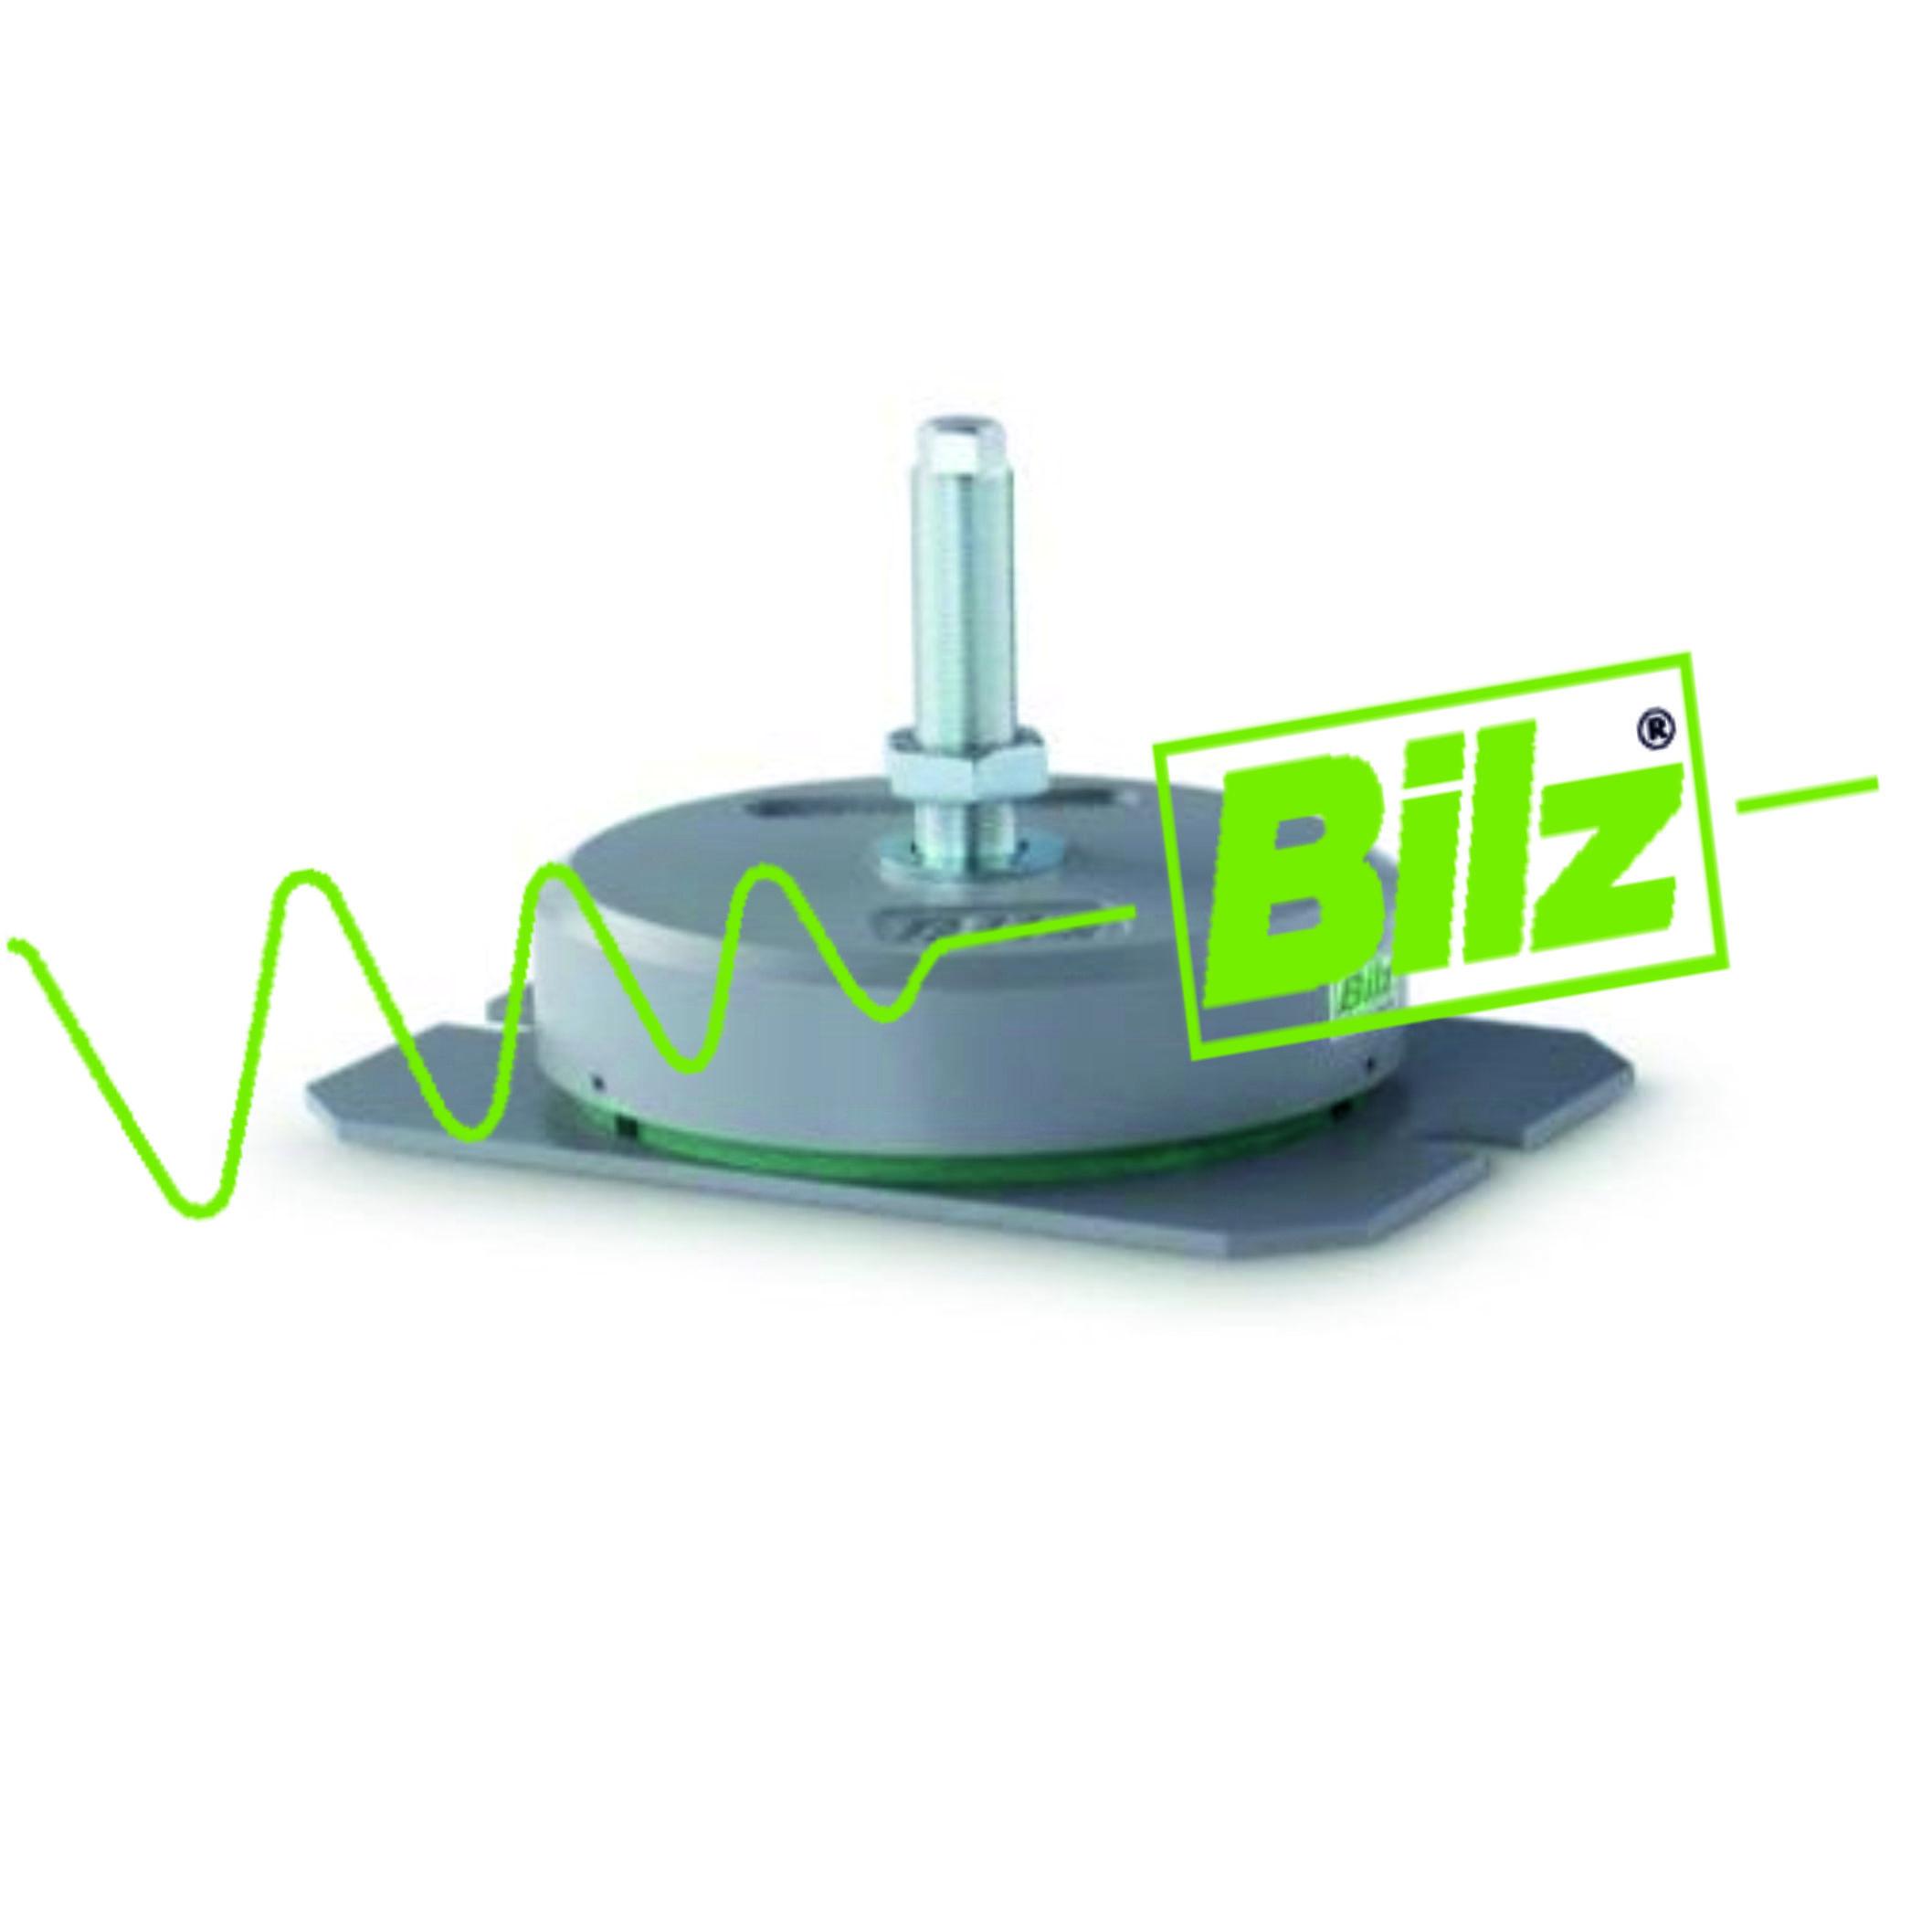 Bilz Leveling Pads